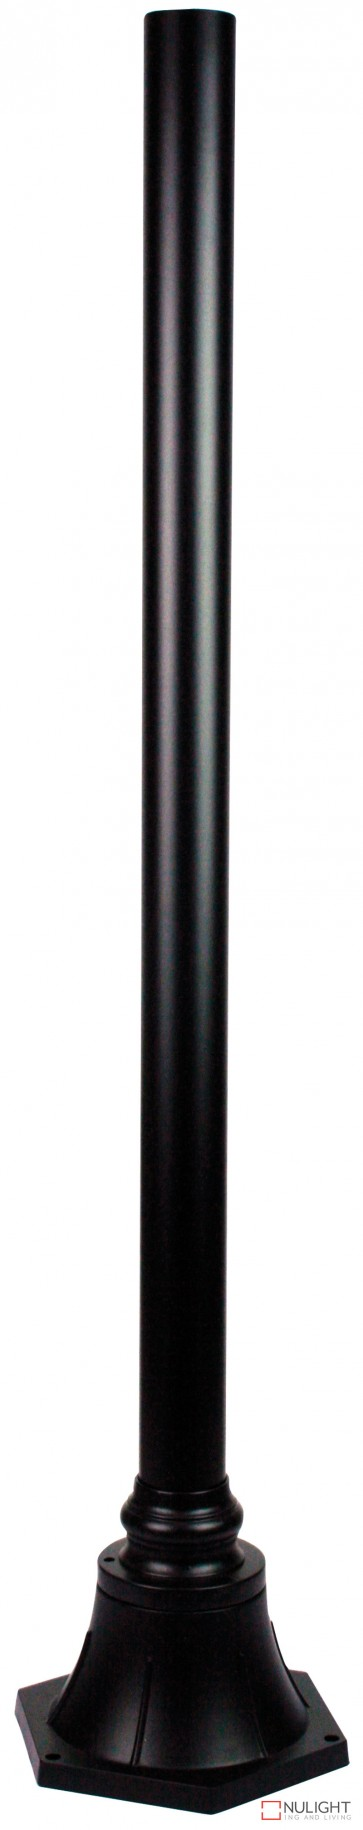 Plumb Post And Flange H1000Mm Black ORI